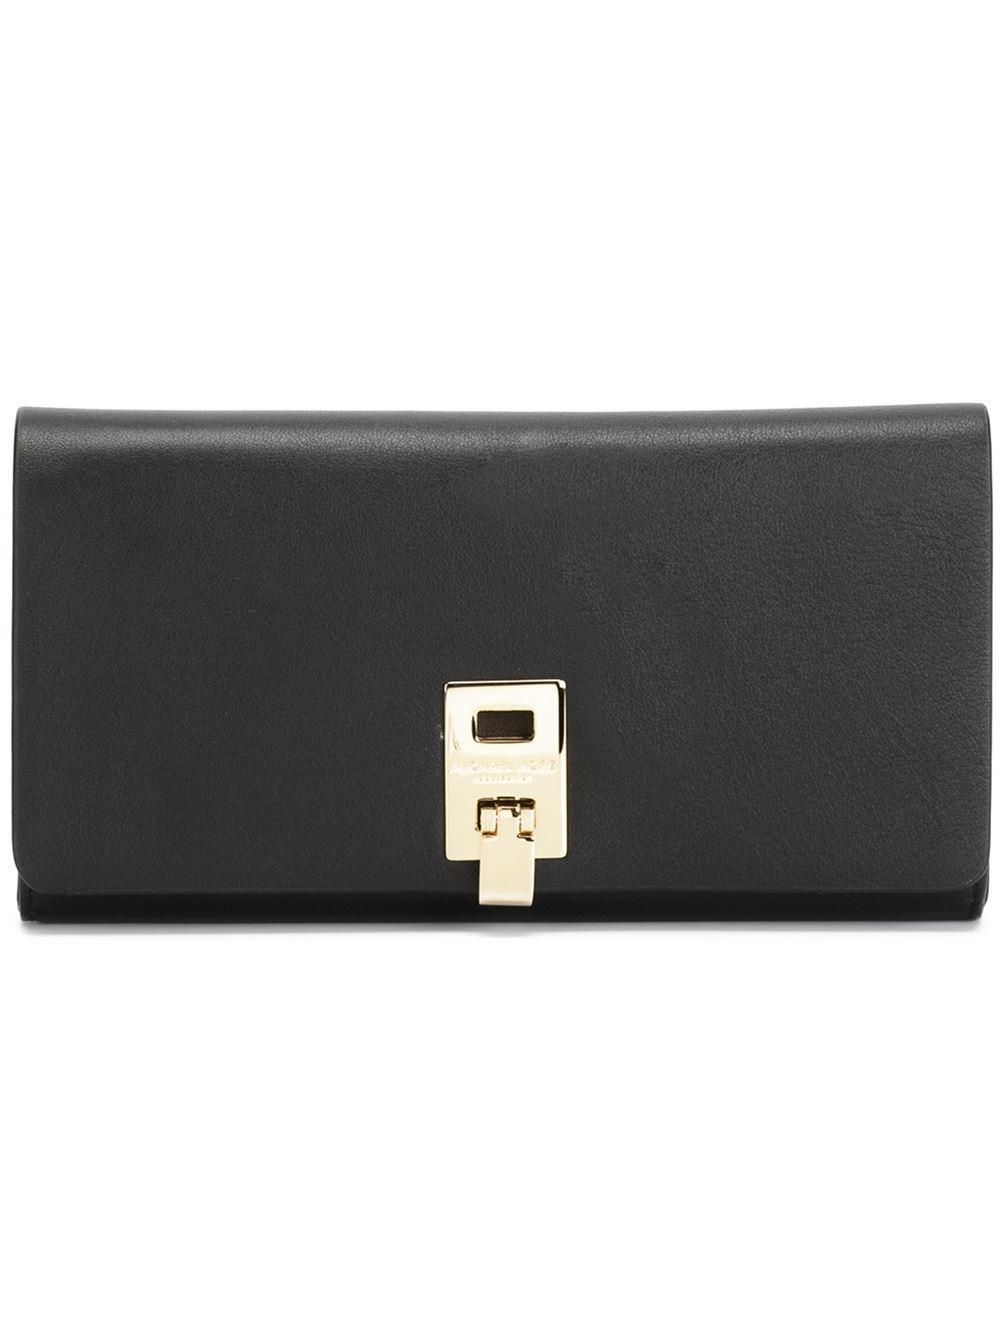 e990db2e77ec Lyst - Michael Kors  miranda  Wallet in Black